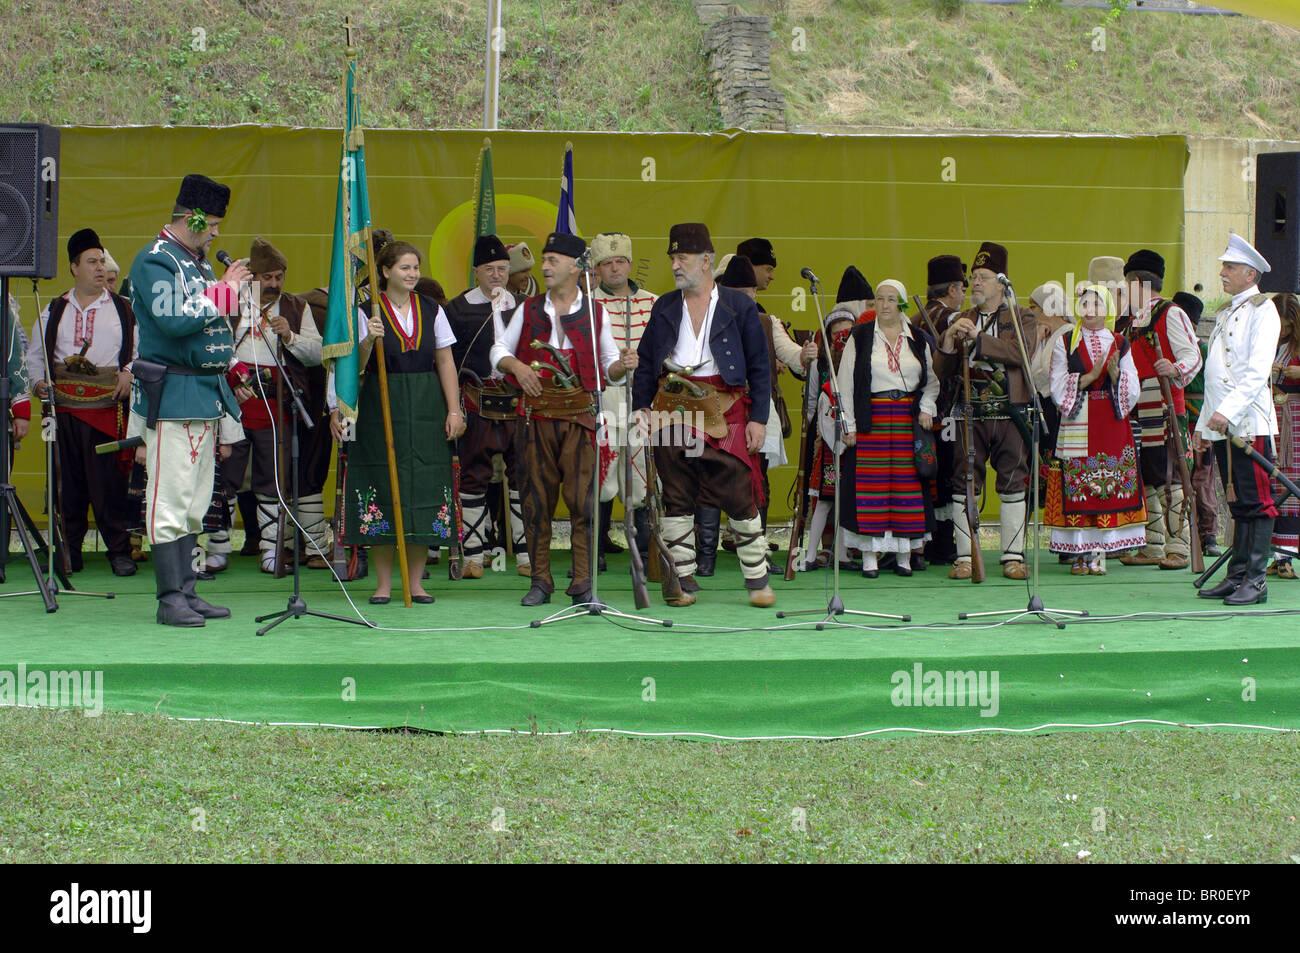 bulgaria amateur